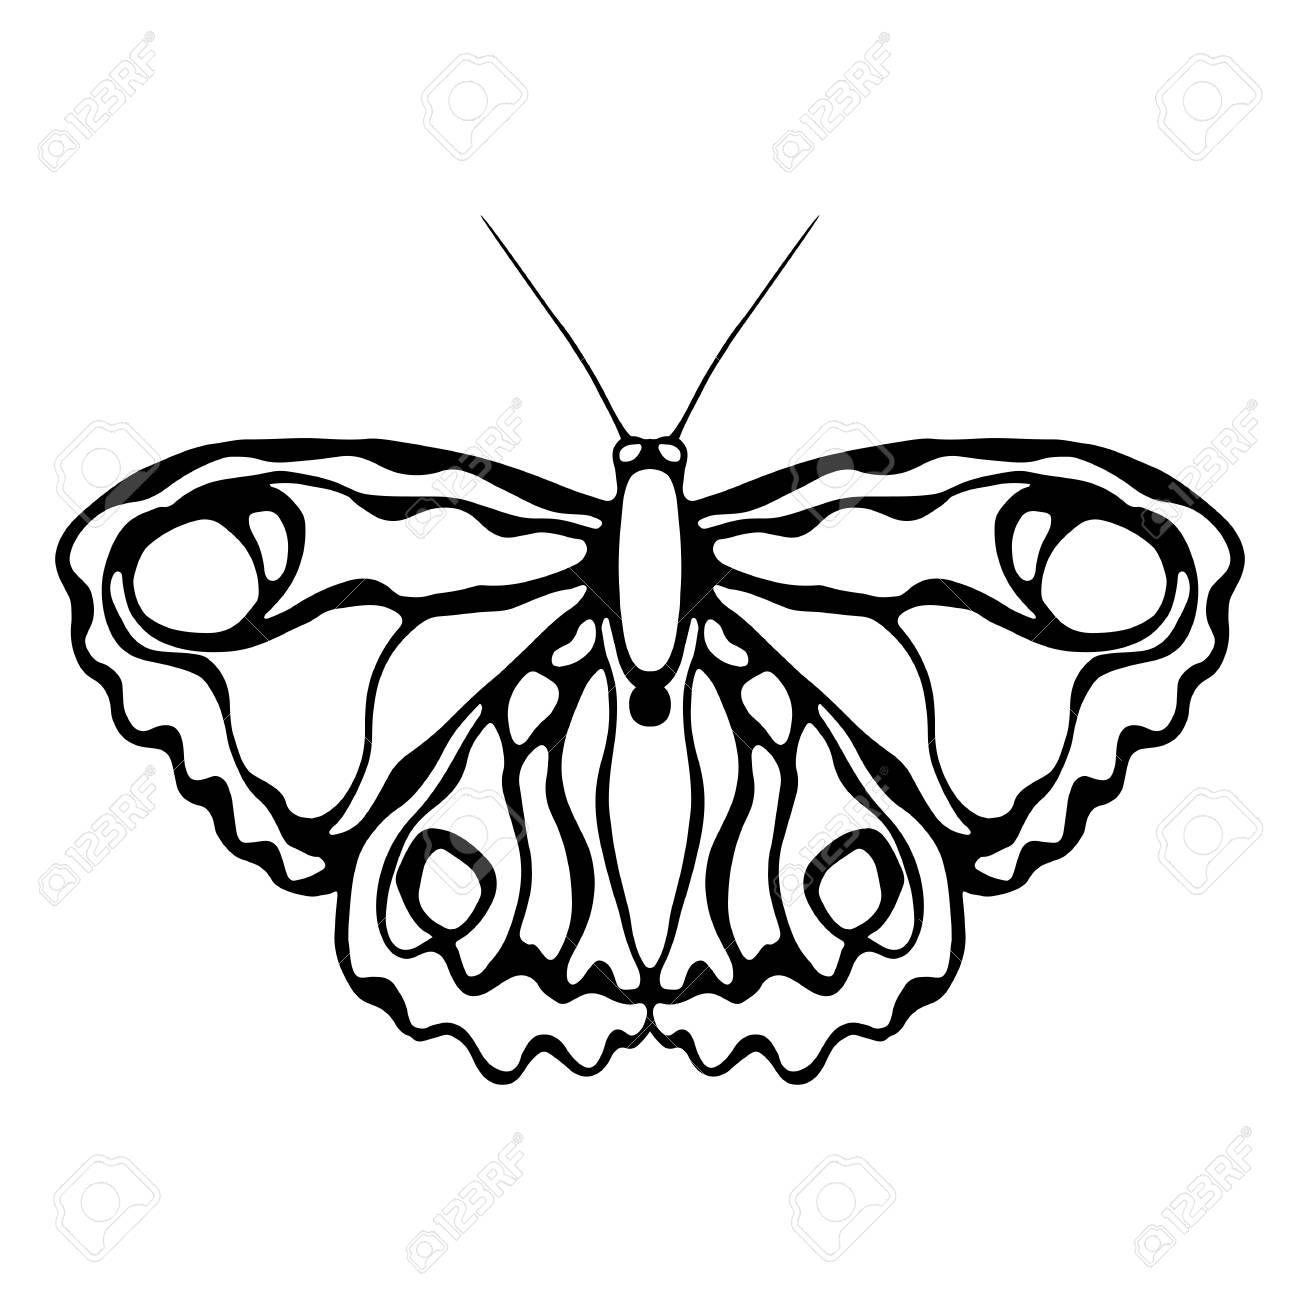 Mariposas Aisladas Sobre Fondo Blanco Diseño De Mariposa Objetos Para Colorear